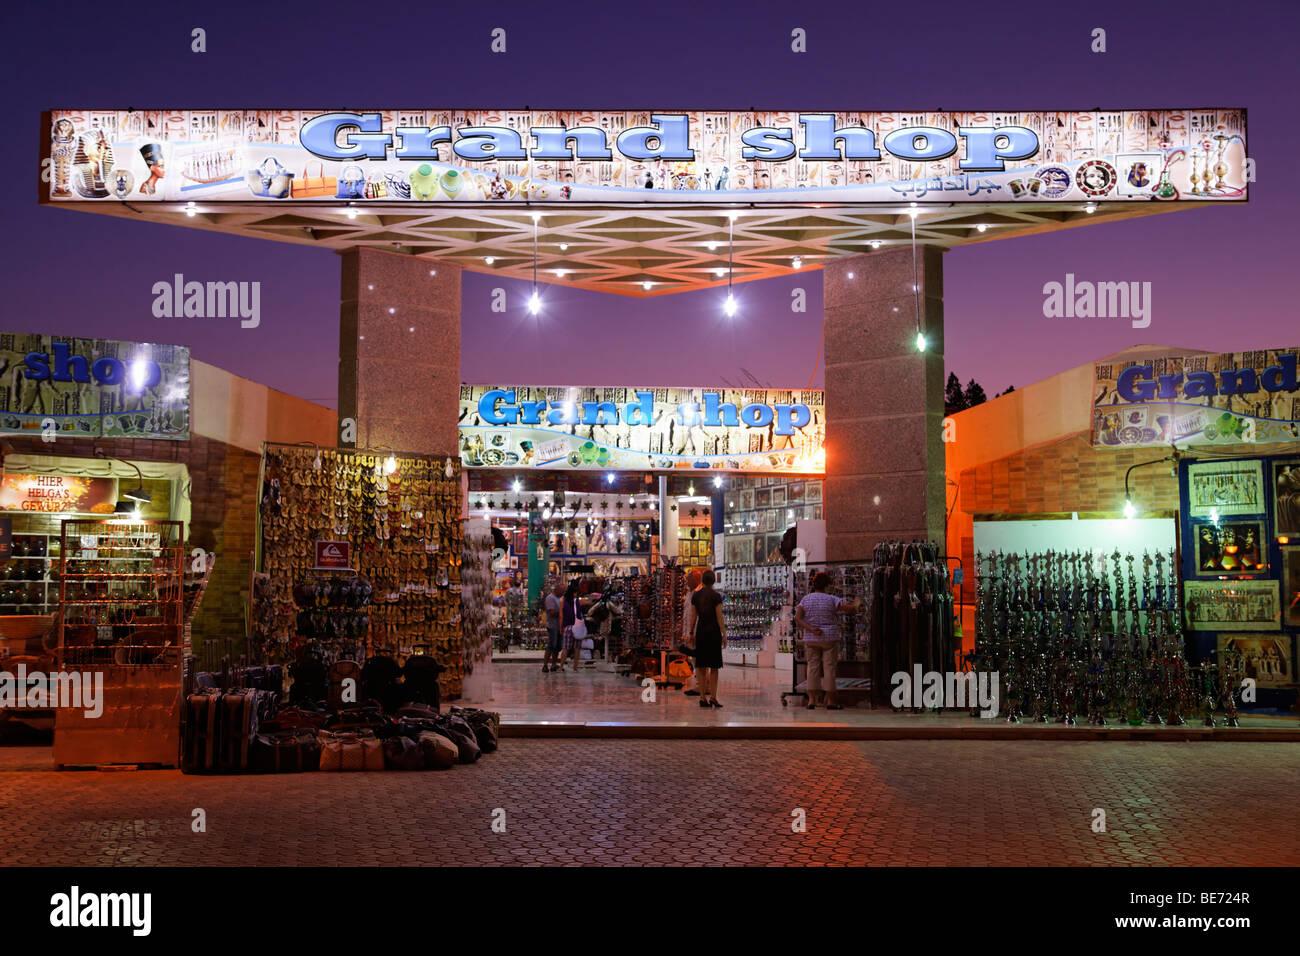 Tienda de souvenirs, iluminado por la noche, Yussuf Afifi Road, Hurghada, Egipto, Mar Rojo, África Imagen De Stock